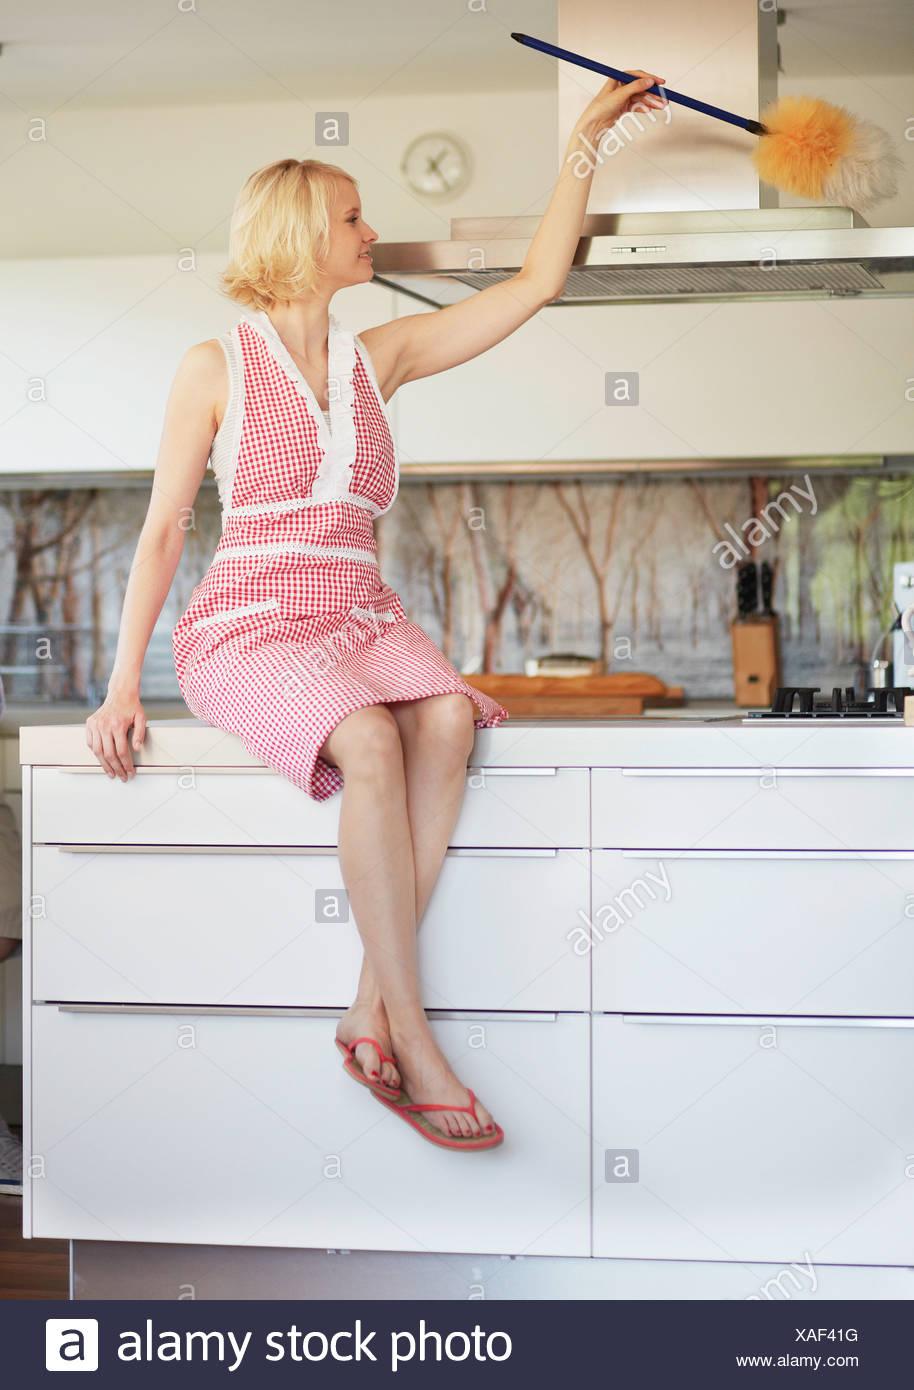 Full Size of Abluftventilator Küchenabluft Abluftventilator Für Küchenabluft Abluftventilator Küche Mit Fernbedienung Abluftventilator Küchenabluft Helios Küche Abluftventilator Küche